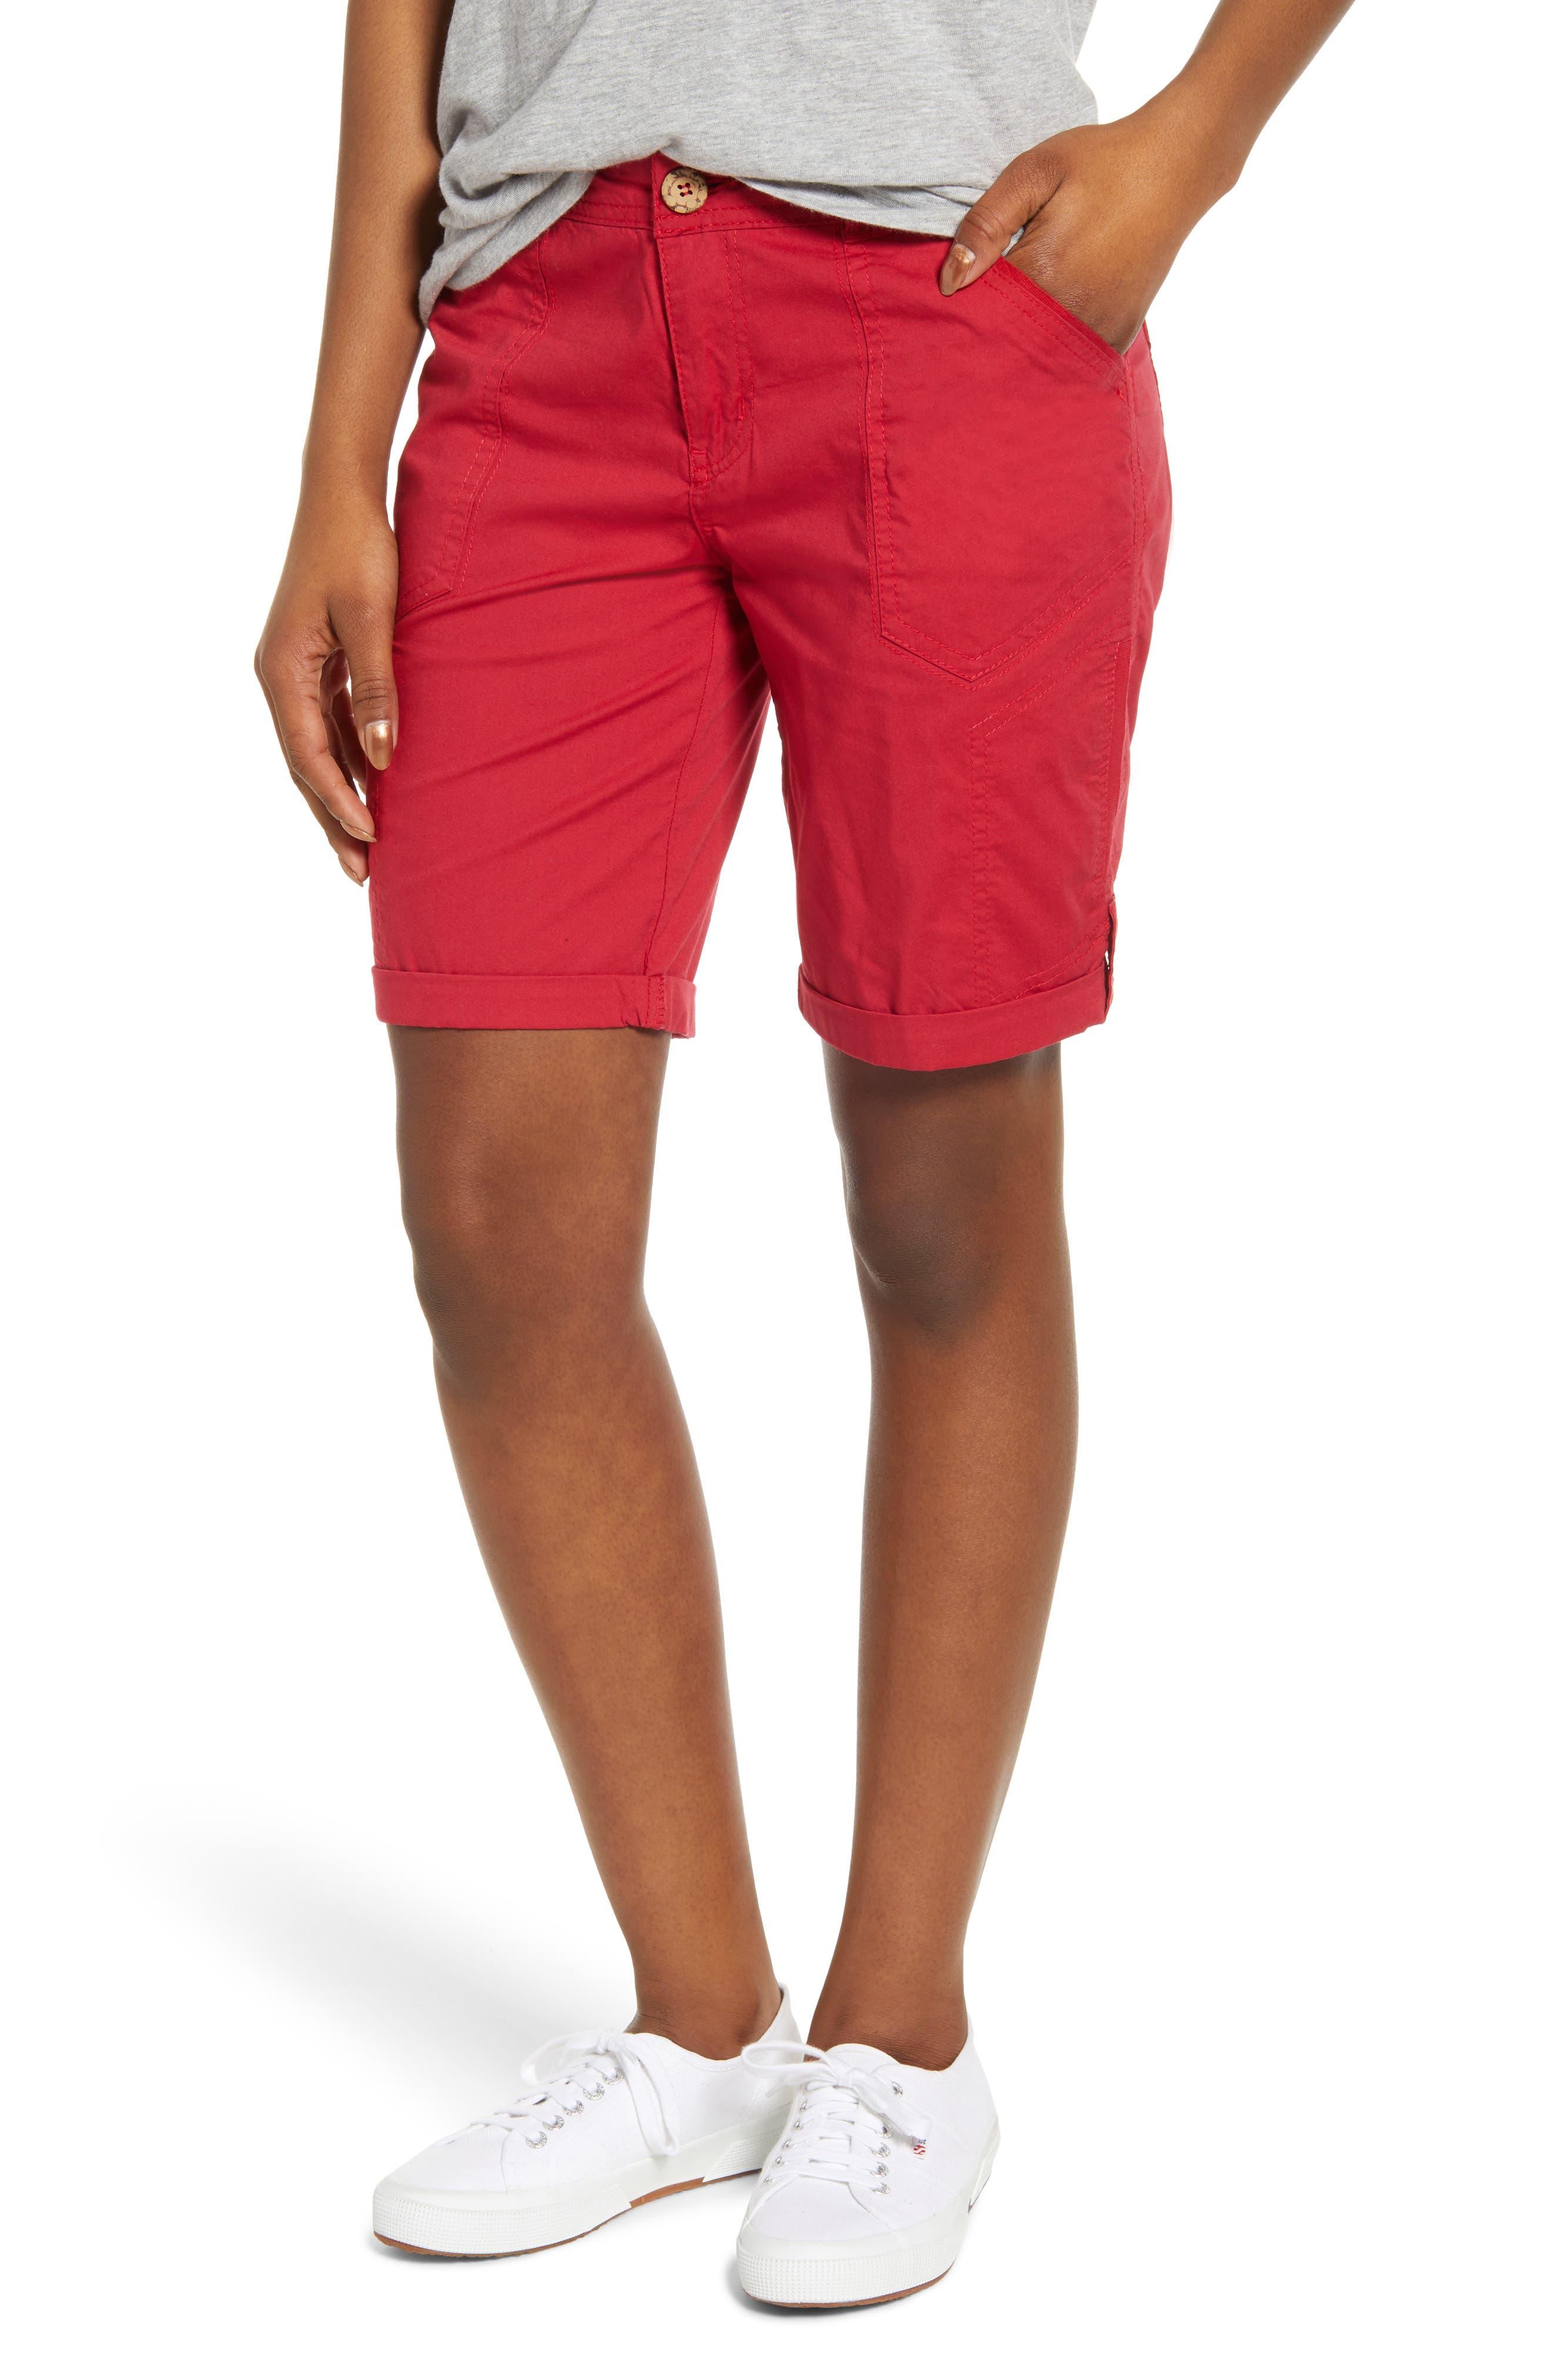 Women's Wit & Wisdom Flex-Ellent Stretch Cotton Bermuda Shorts